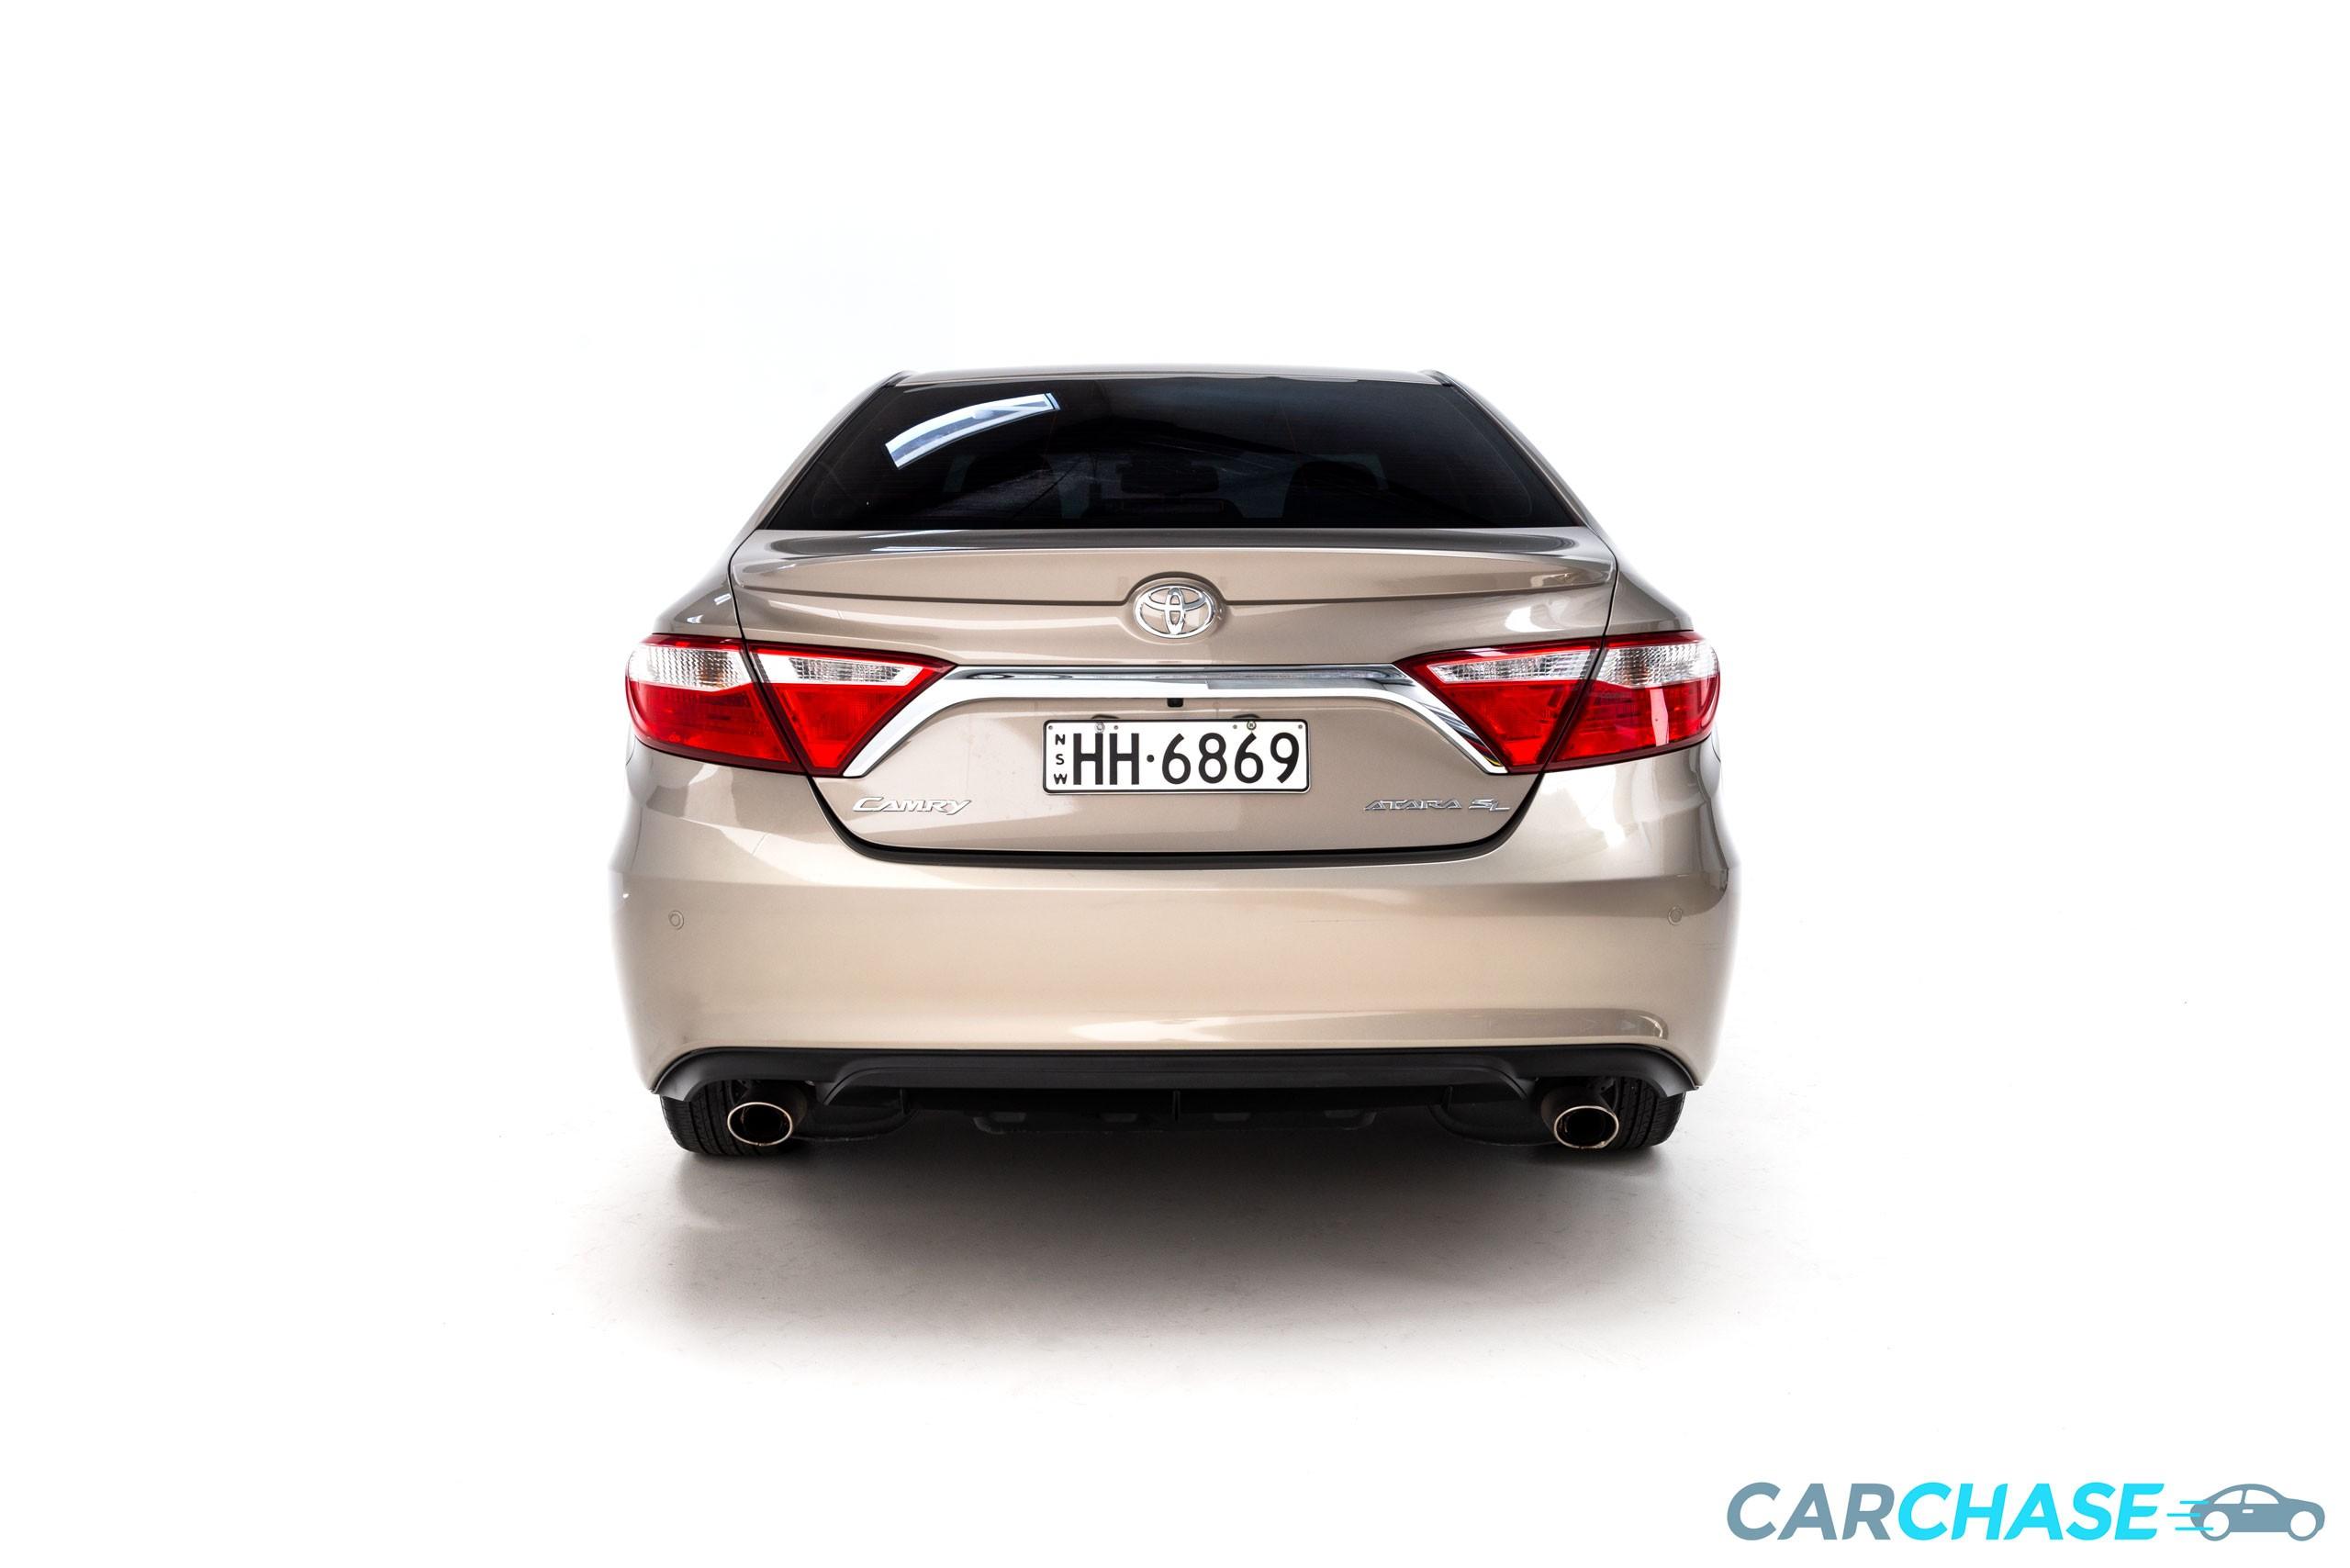 Image of rear profile of 2015 Toyota Camry Atara SL